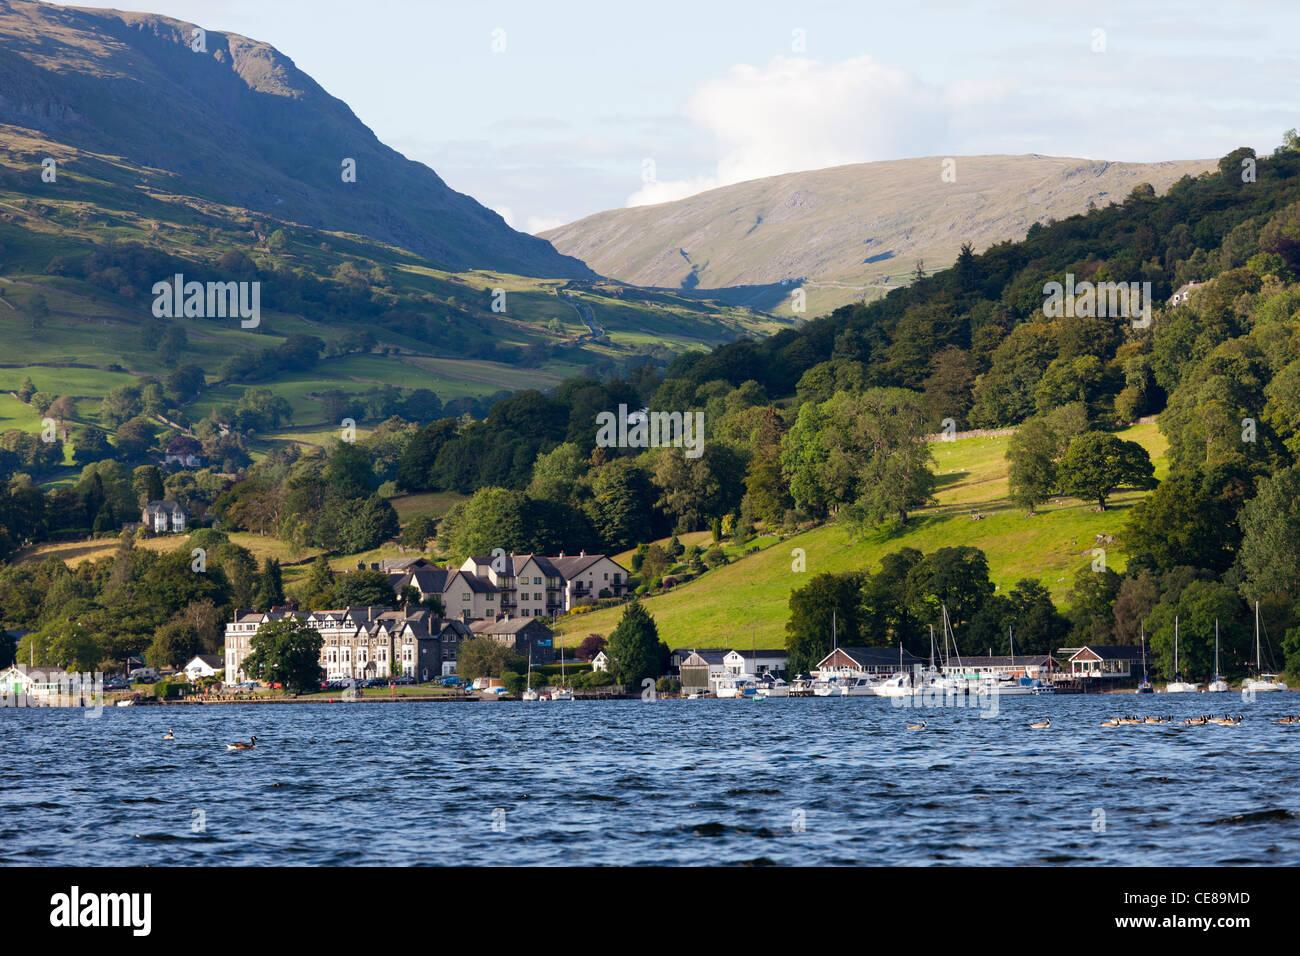 Lake Windermere Cumbria, England - Stock Image